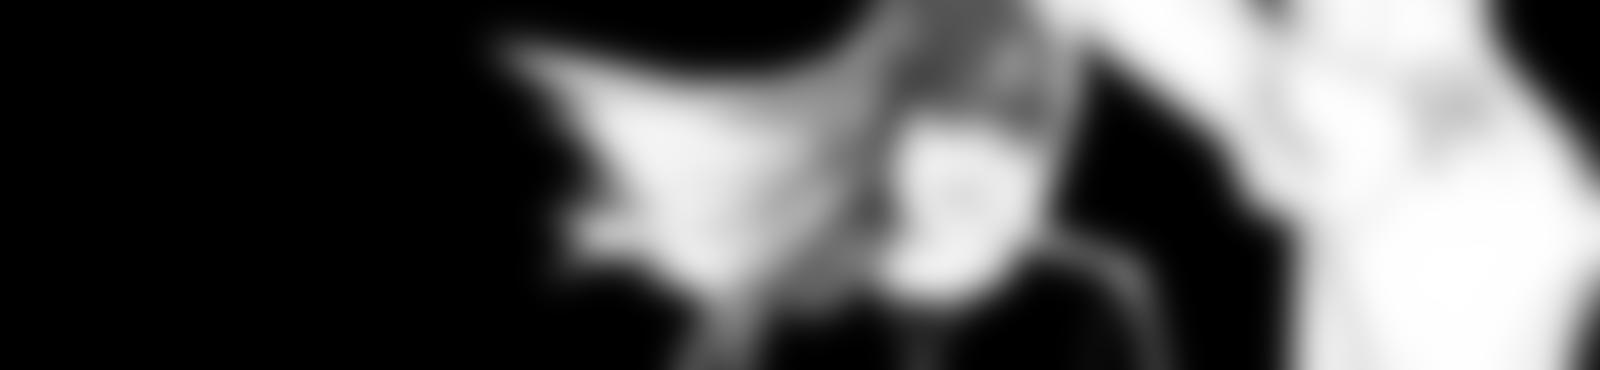 Blurred 0a7e2ea9 8ad8 4691 bcab 7628bcb41b49